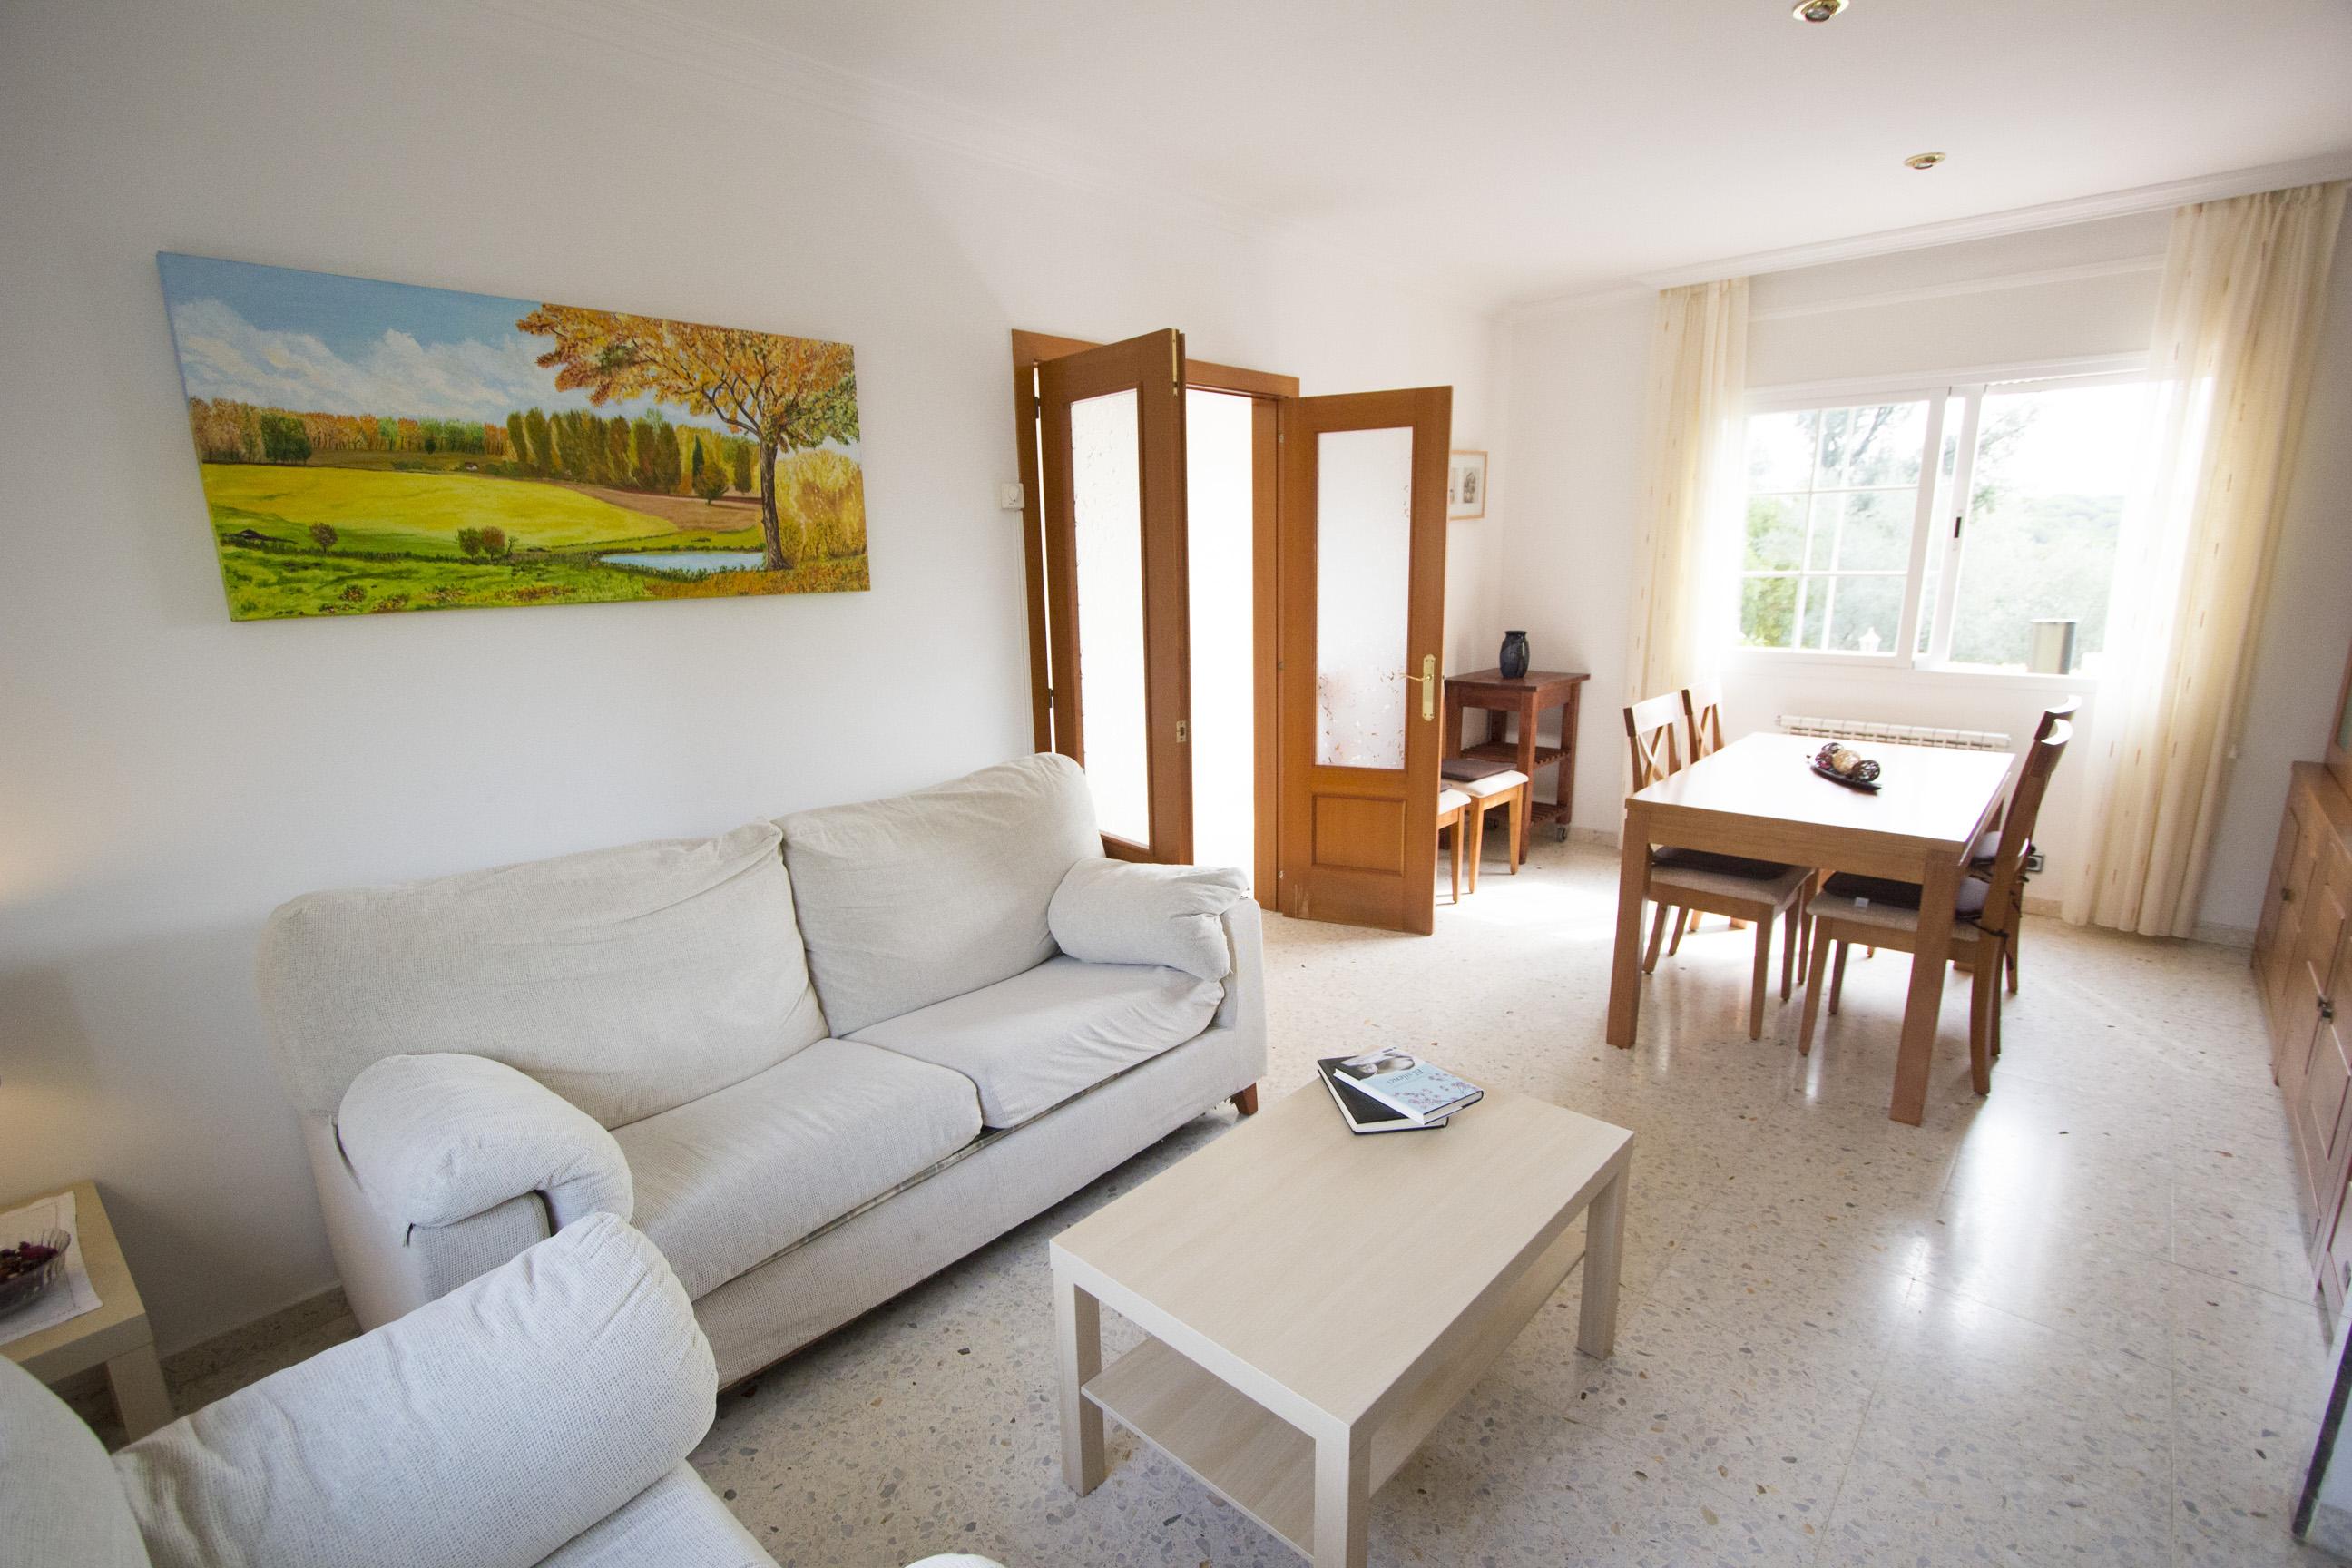 Ferienhaus Catalunya Casas: Peaceful Villa Sils, just 20 km from Costa Brava beaches! (2302155), Les Mallorquines, Girona, Katalonien, Spanien, Bild 12